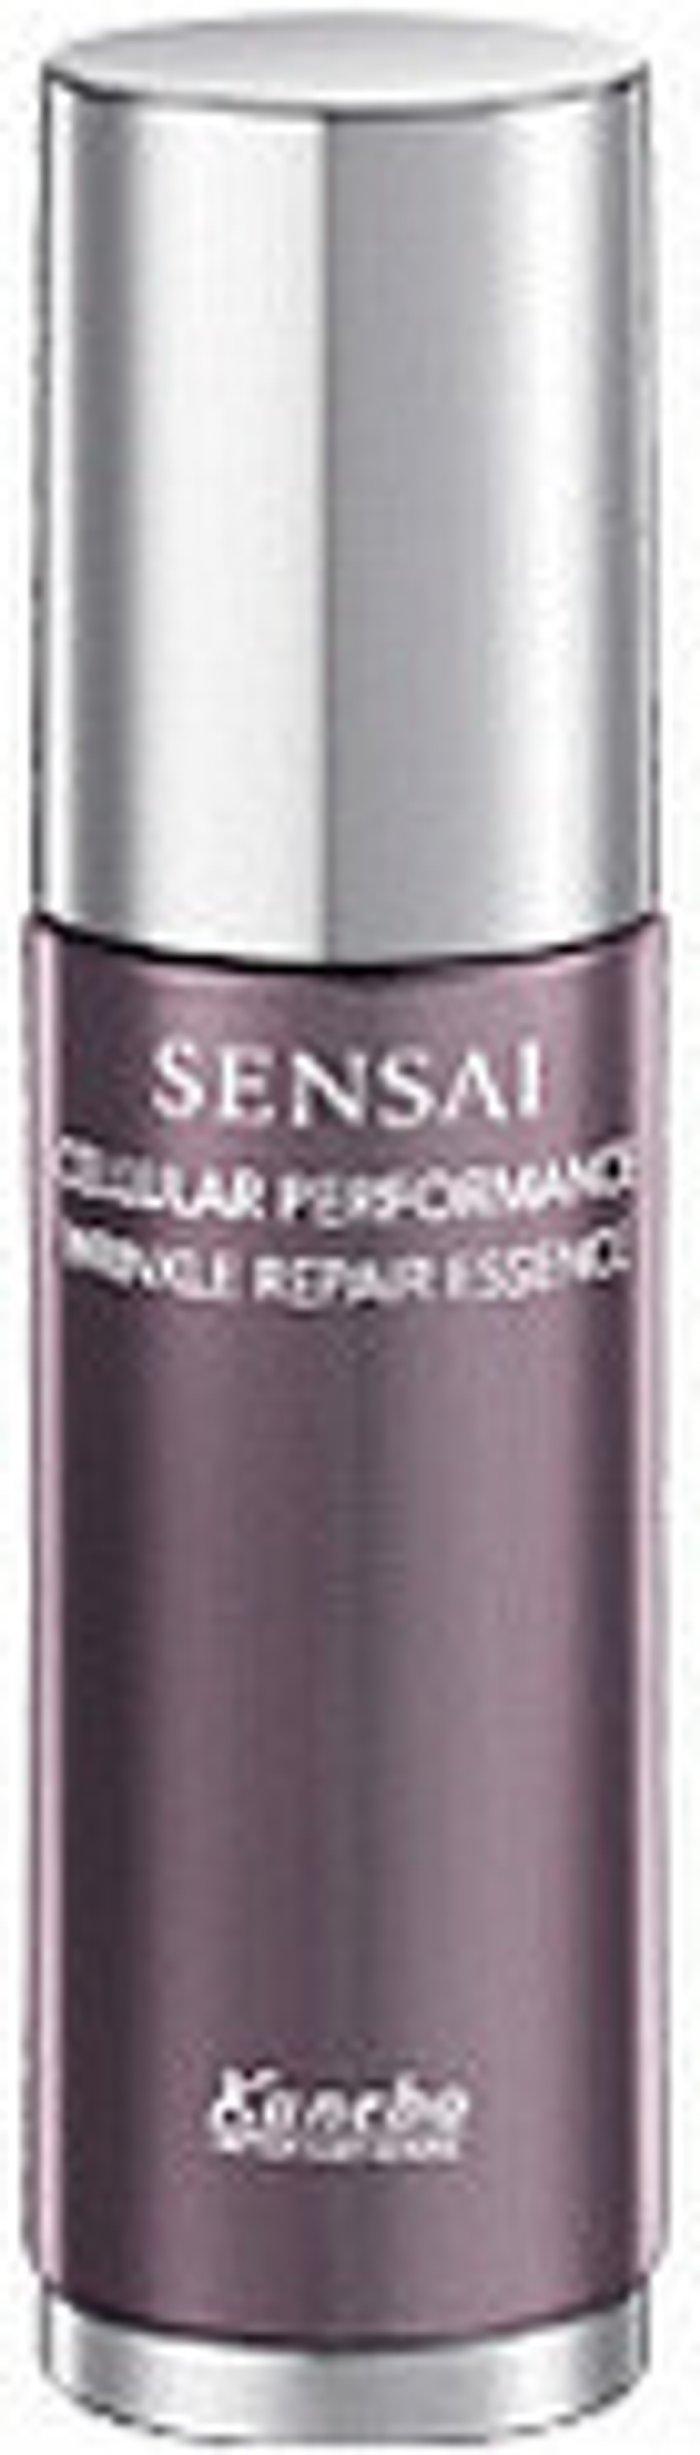 Kanebo Kanebo Sensai Cellular Wrinkle Essence (40ml)